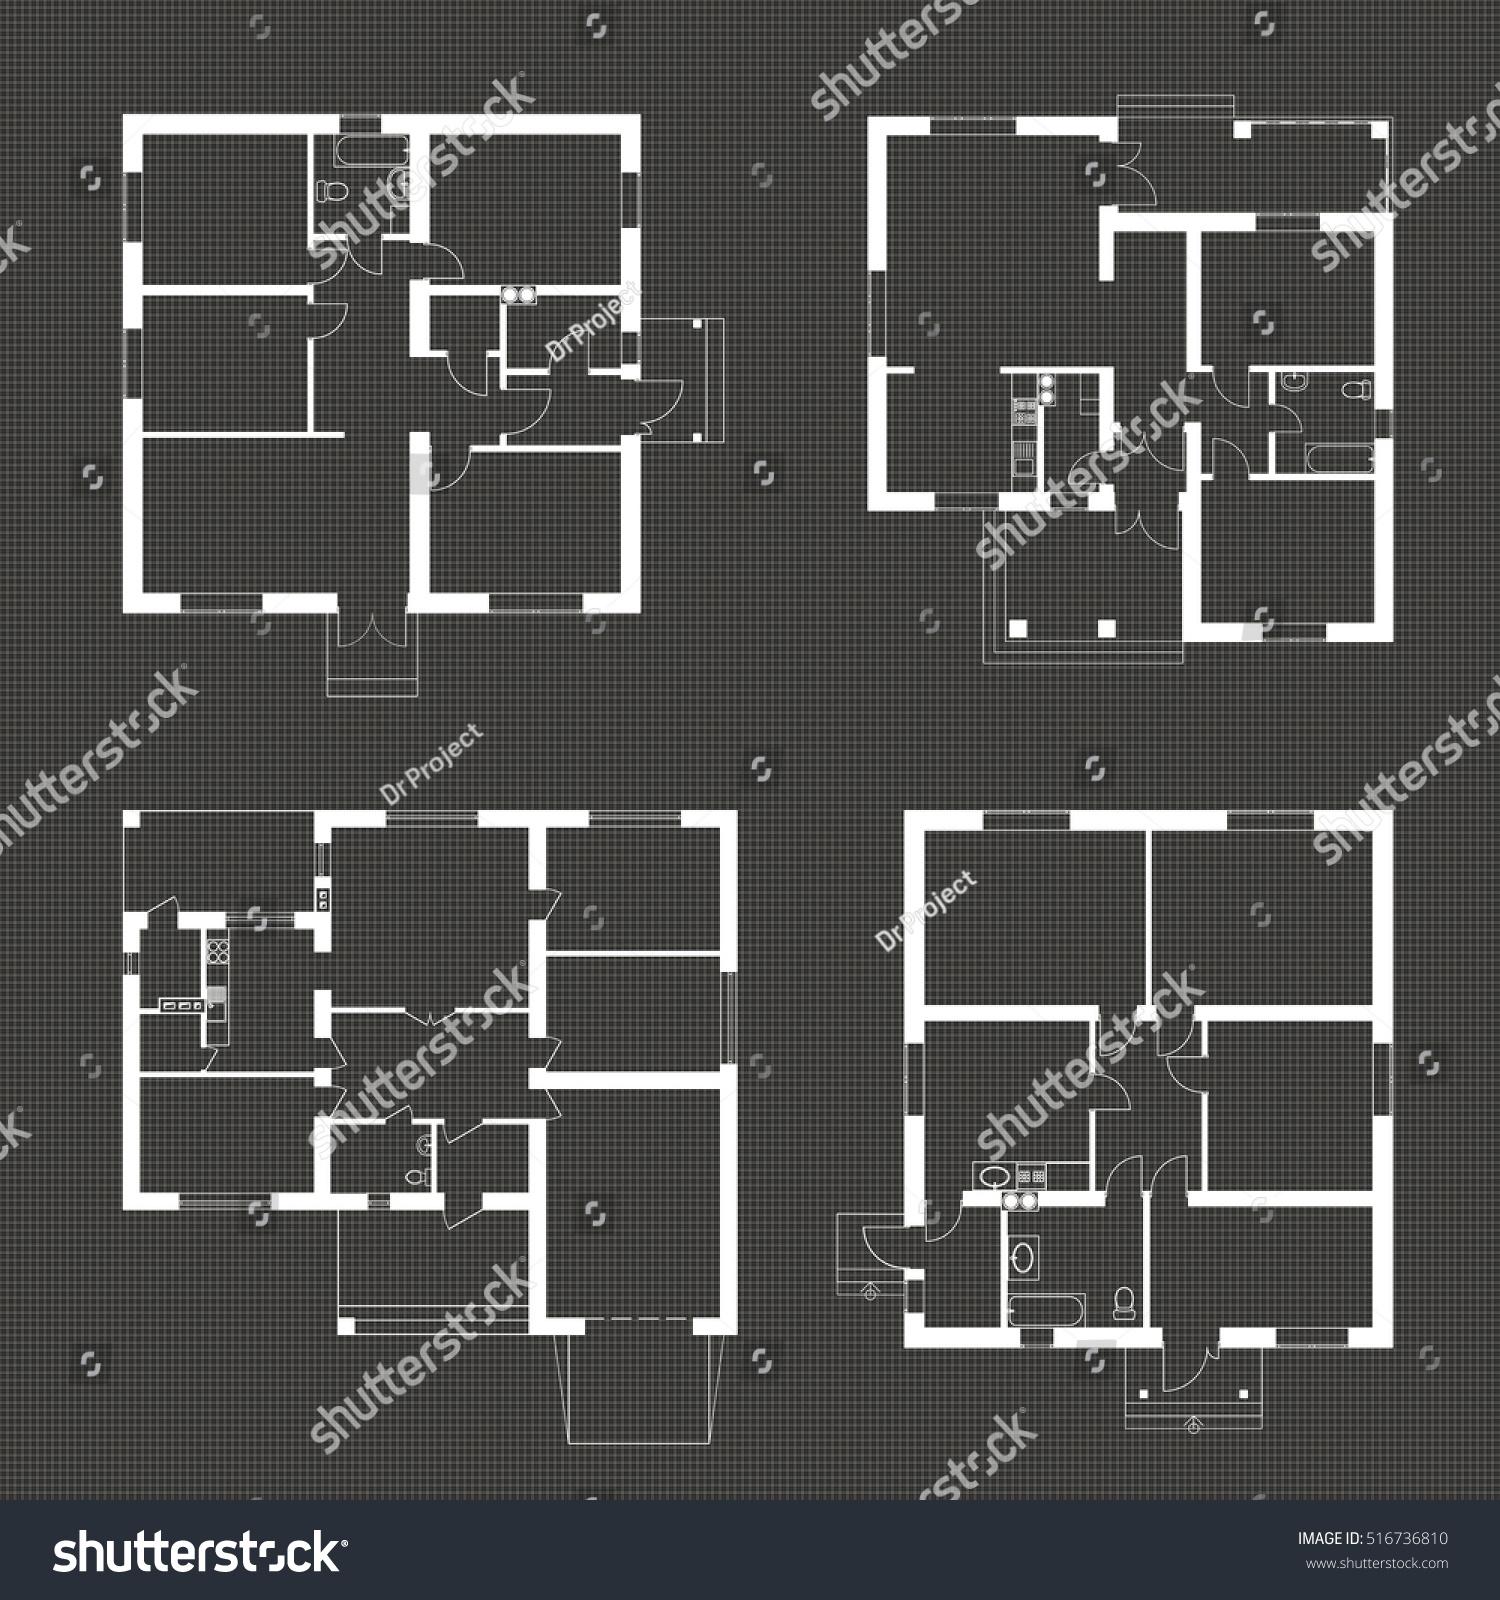 Architectural Set Ground Floor Blueprints Vector Stock Vector ...